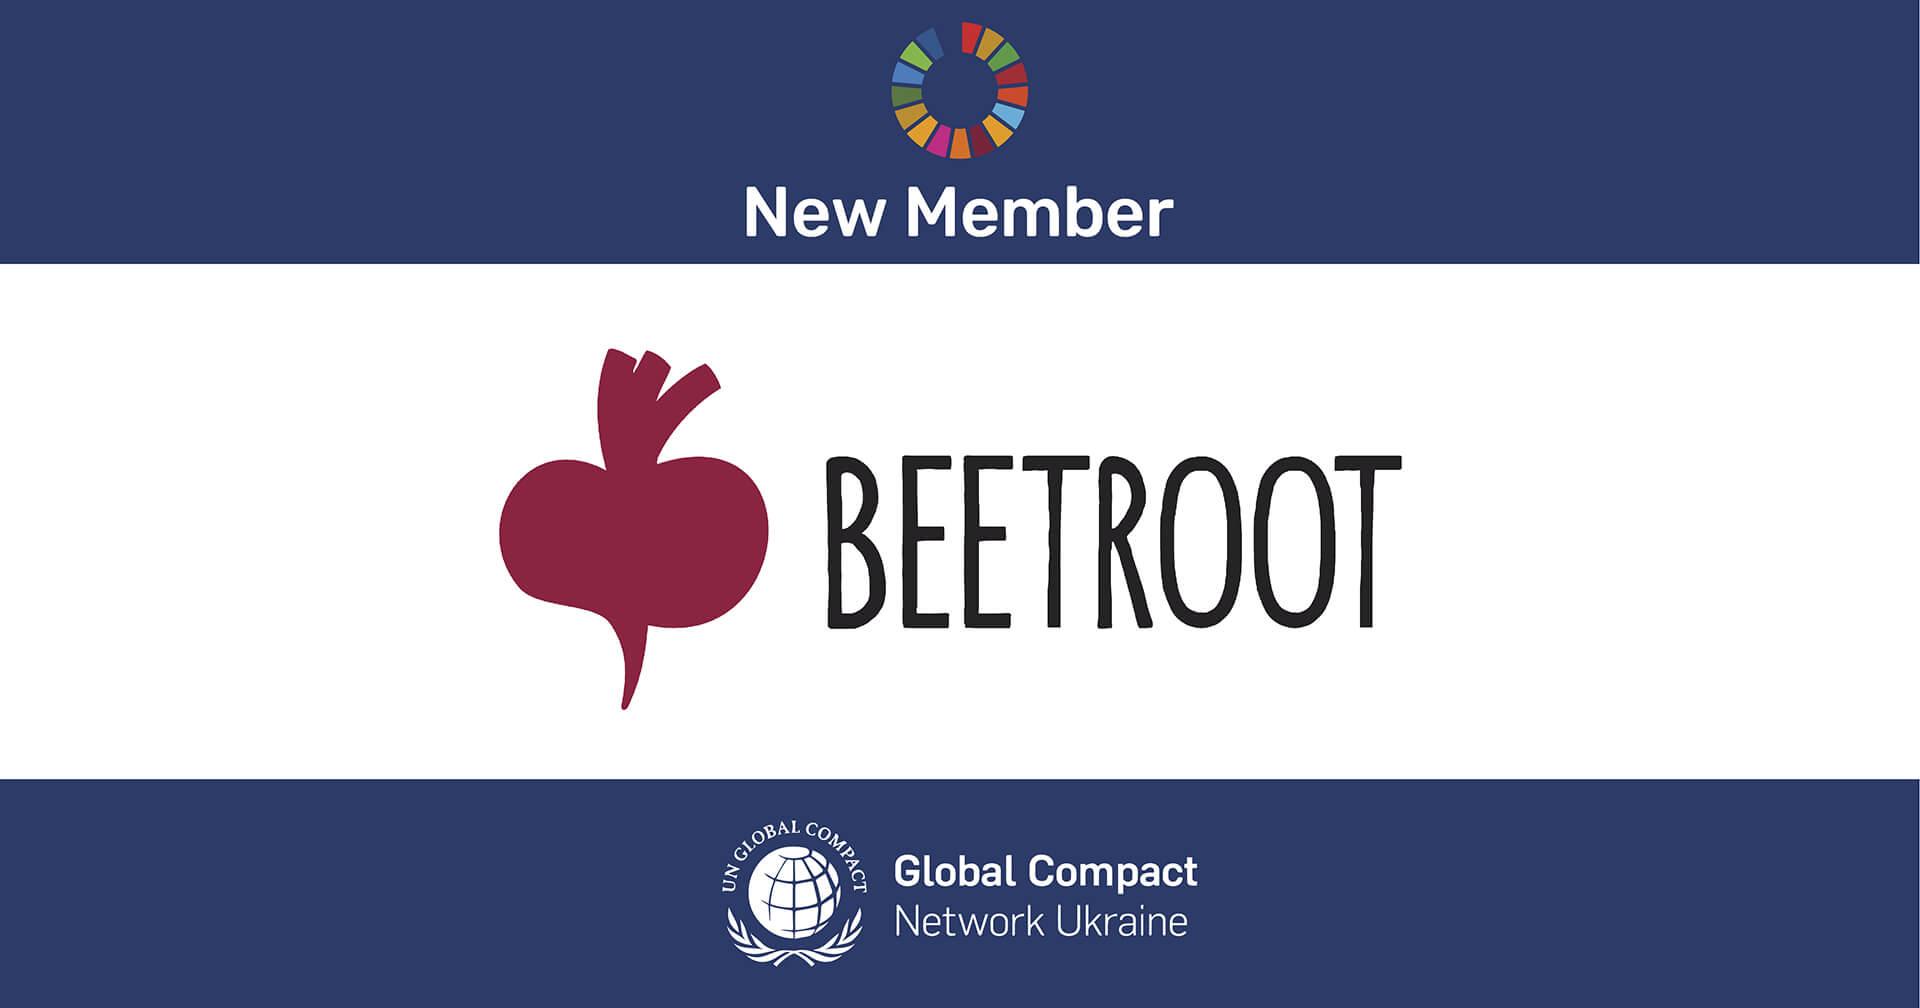 Beetroot Joins Global Compact Network Ukraine